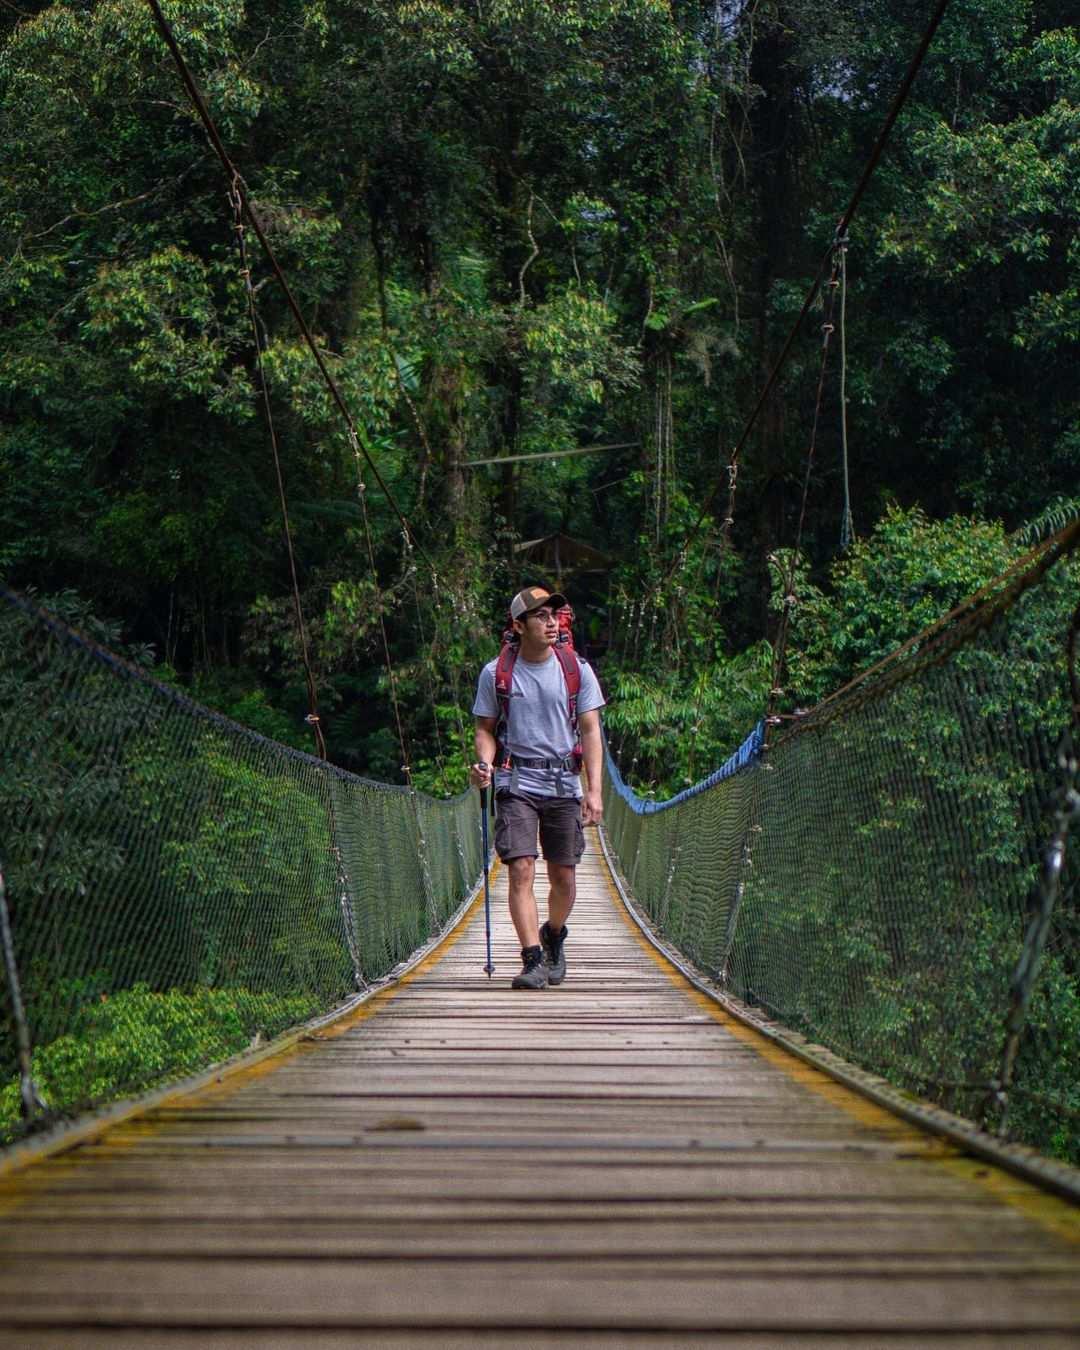 Tracking di Jembatan Gantung Situ Gunung Sukabumi Image From @trianasarir